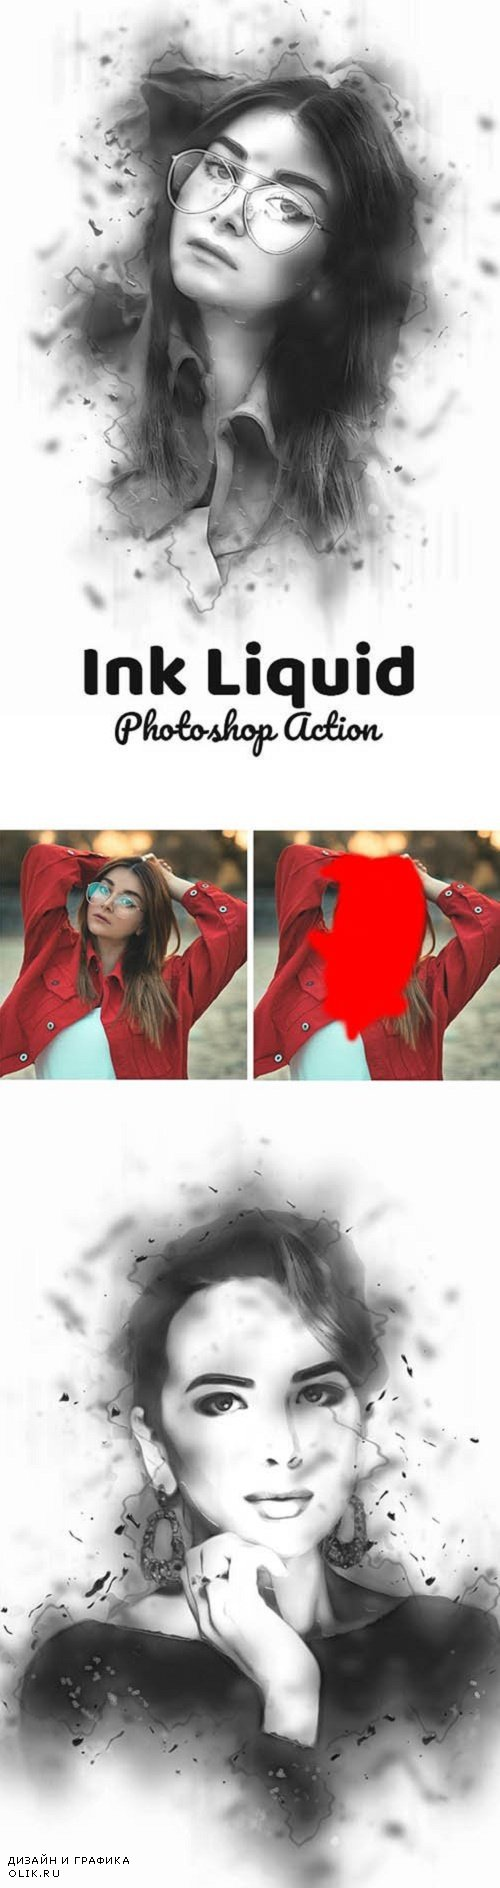 Ink Liquid Effect PHSP Action 24233027